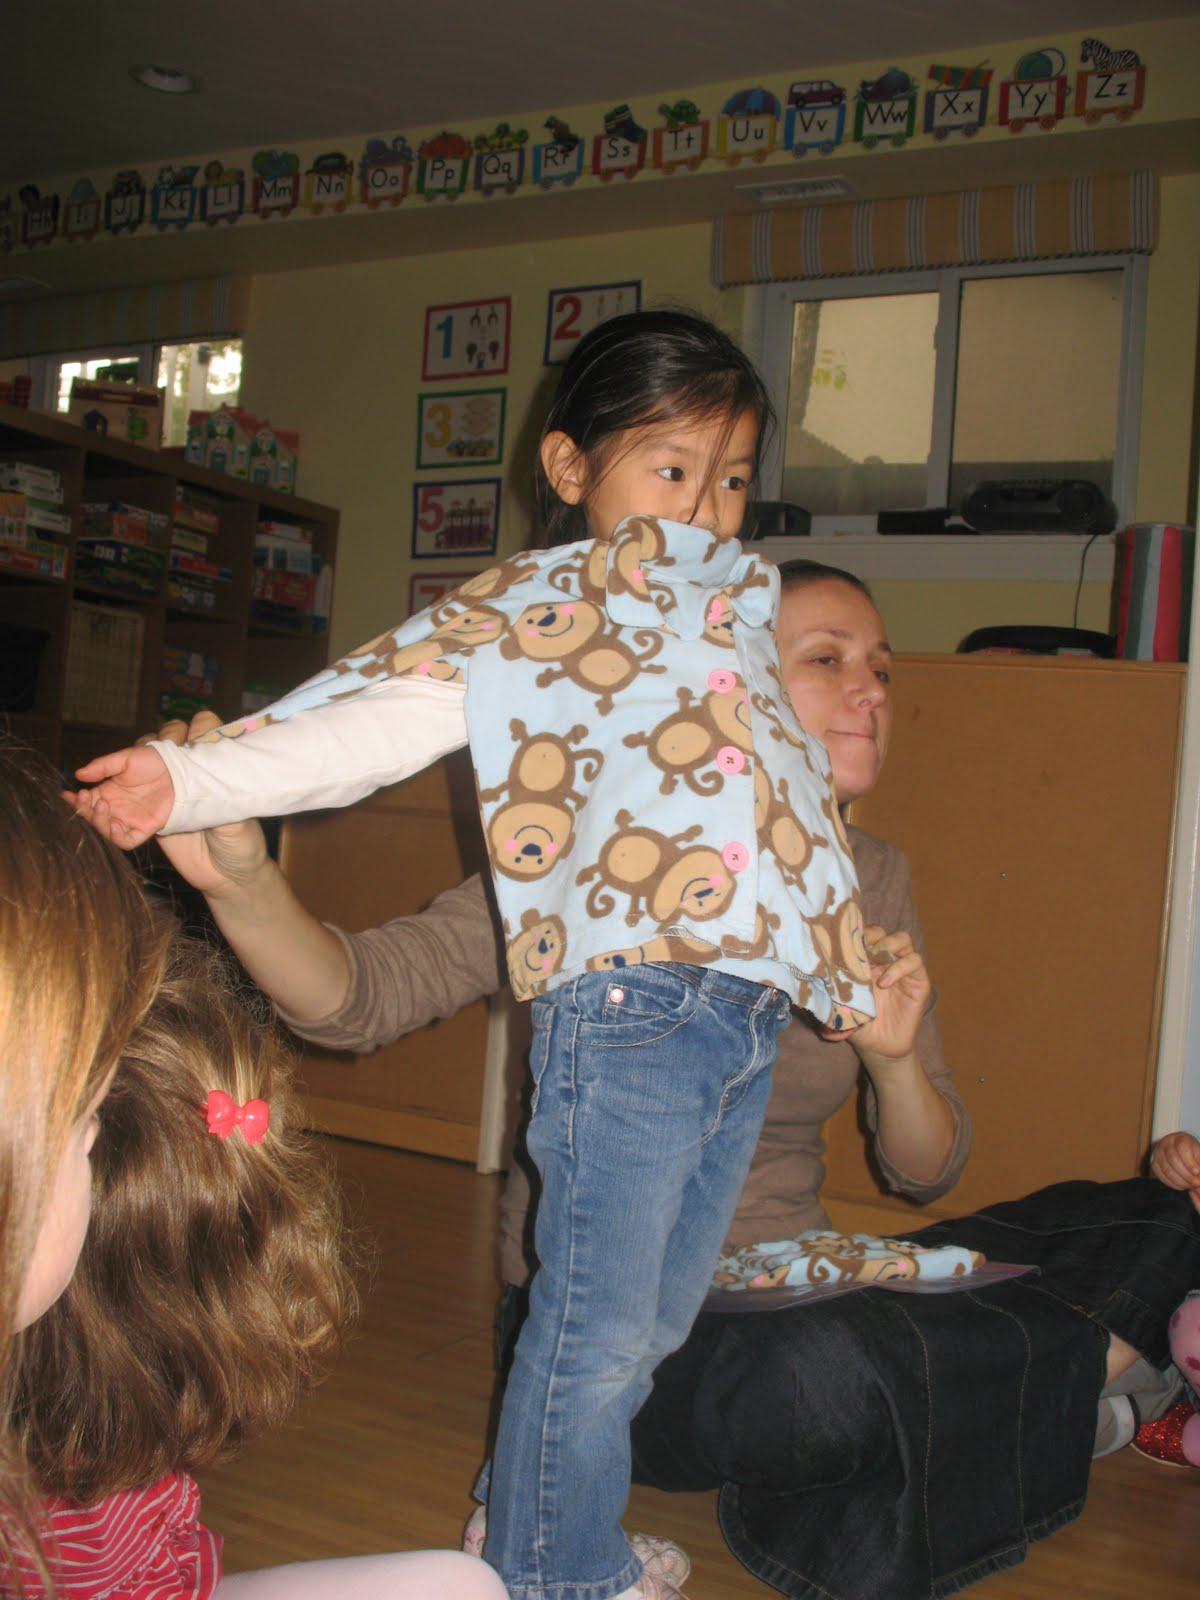 preschool show and tell letter q kinder gan preschool pre k show n tell letter m 918